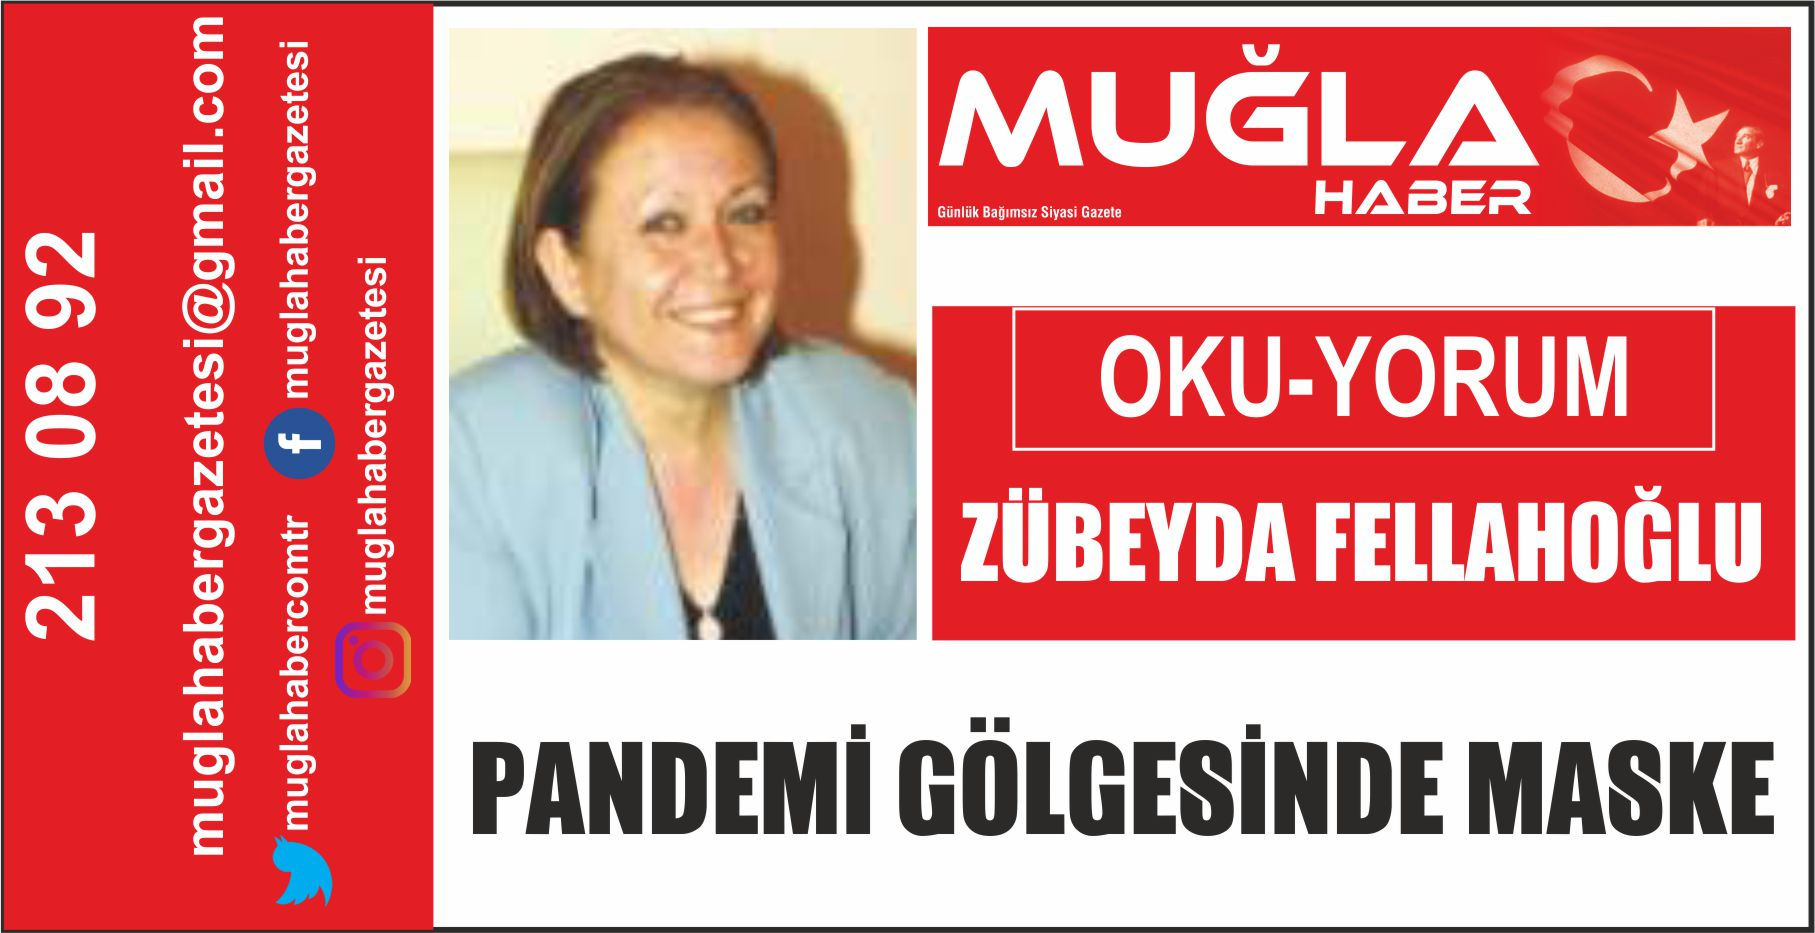 PANDEMİ GÖLGESİNDE MASKE